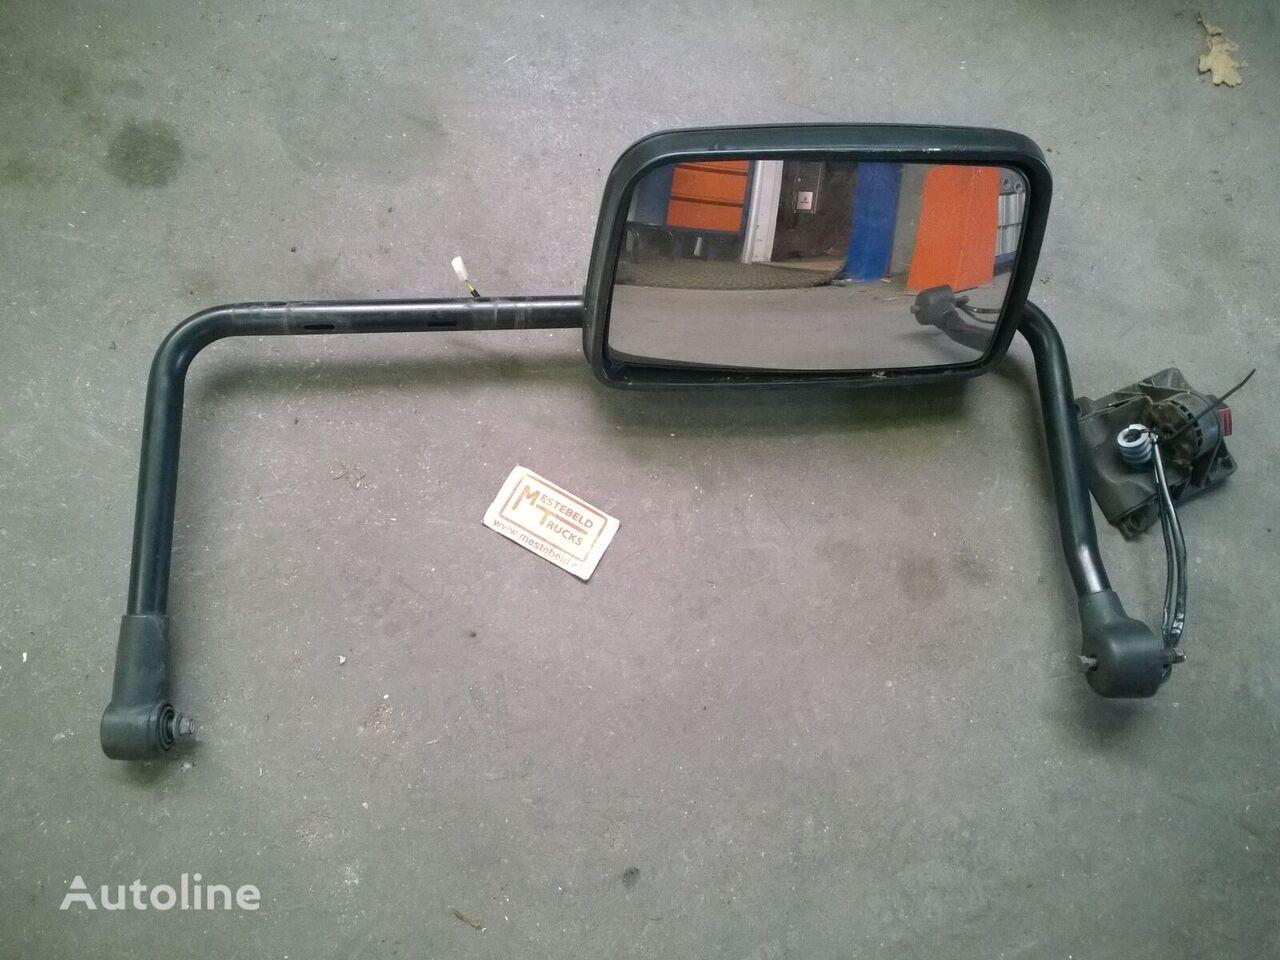 specchio retrovisore DAF per trattore stradale DAF Spiegel + steun LF45 rechts